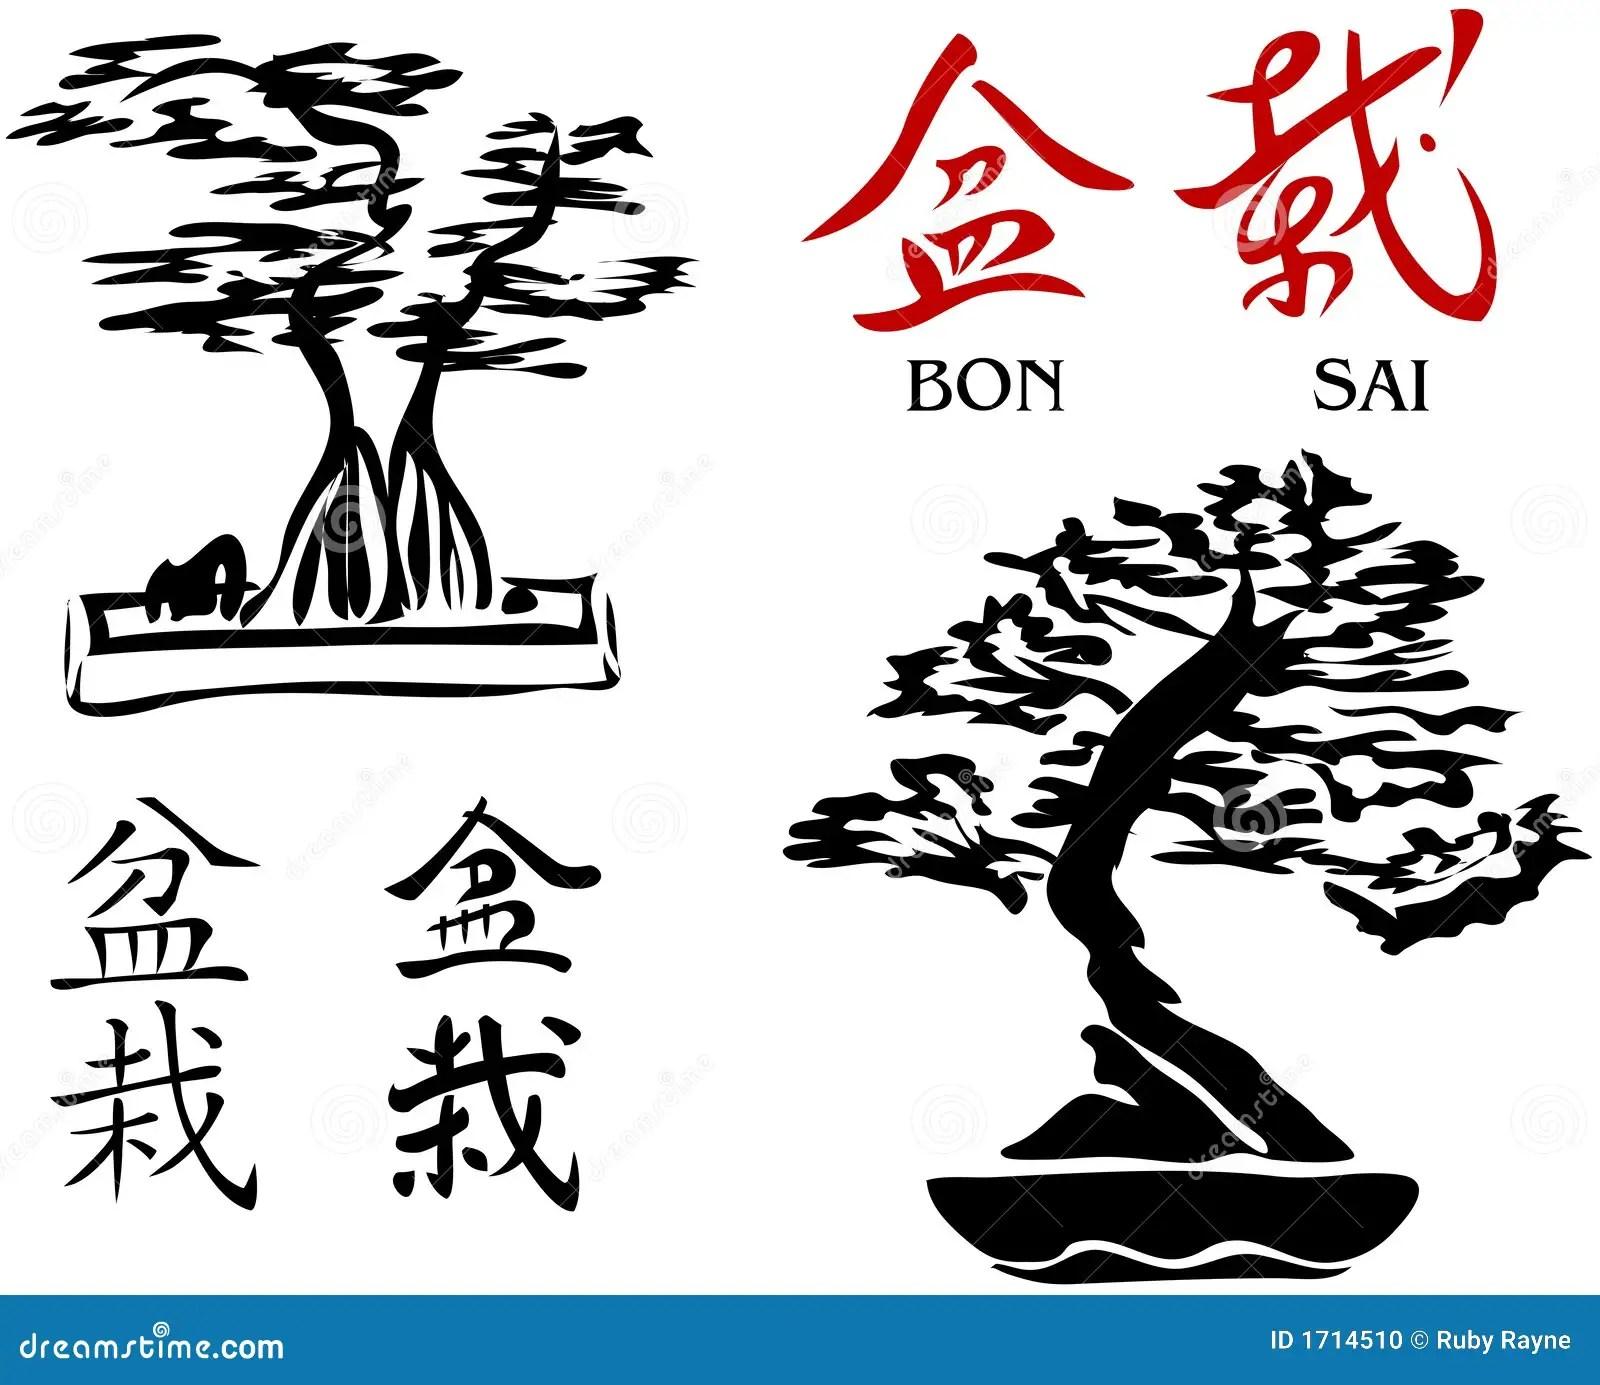 Arboles De Los Bonsais Y Caracteres De Kanji 2 Vector